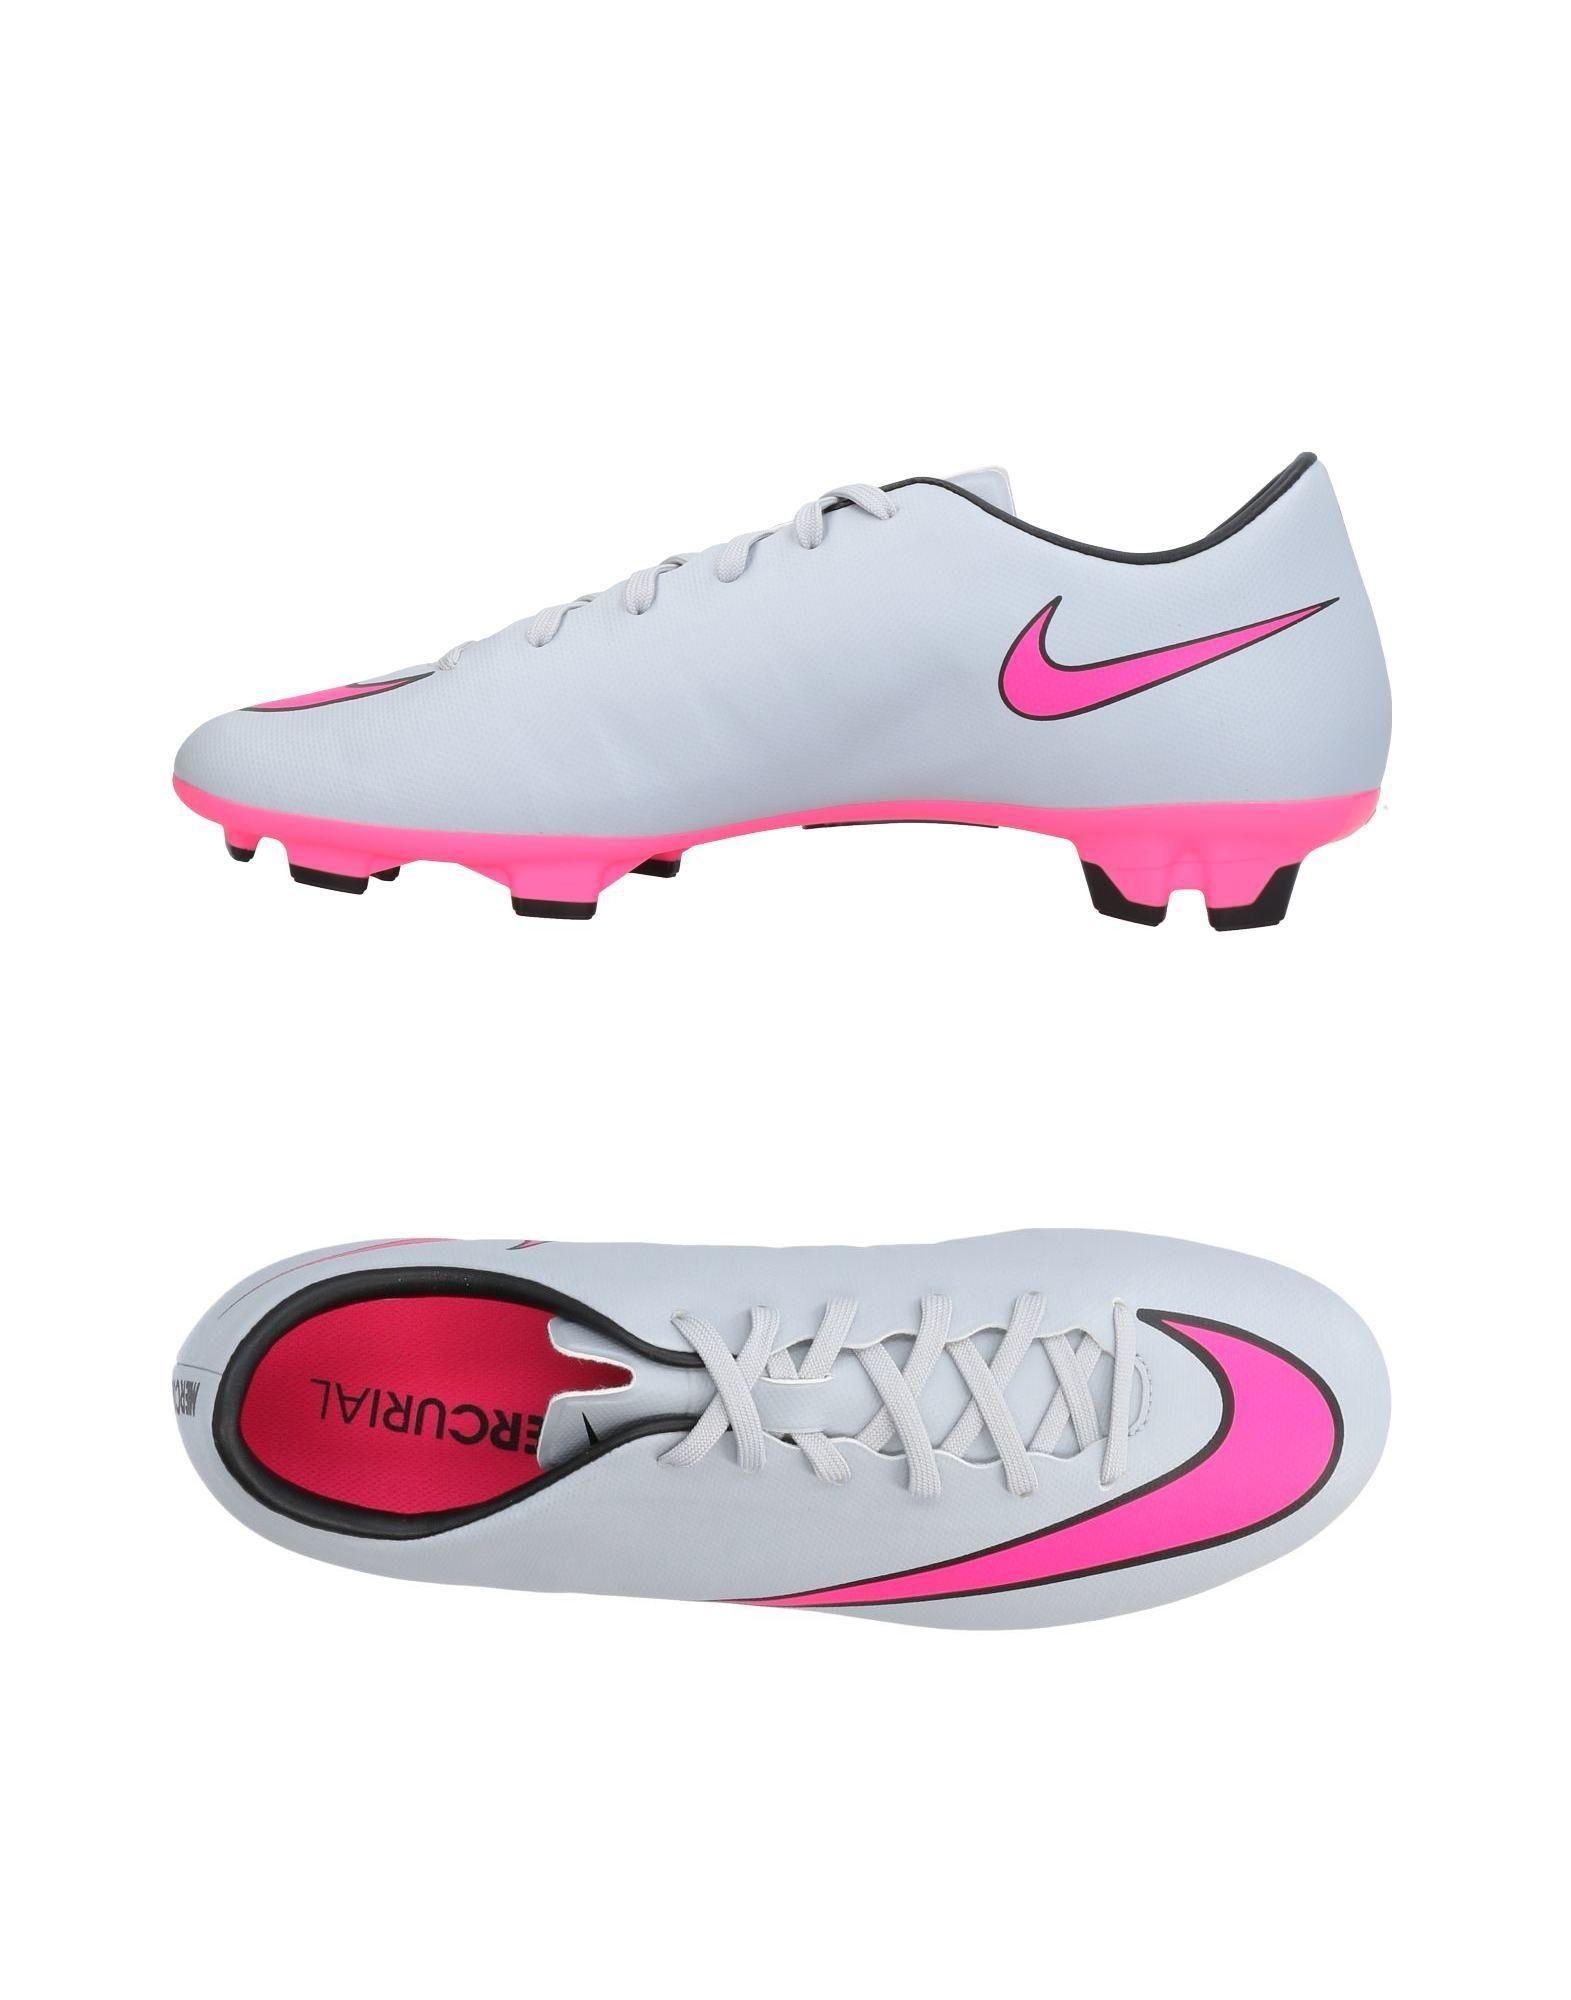 Moda Scarpe - da Ginnastica Nike Uomo - Scarpe 11440199OL 521ded